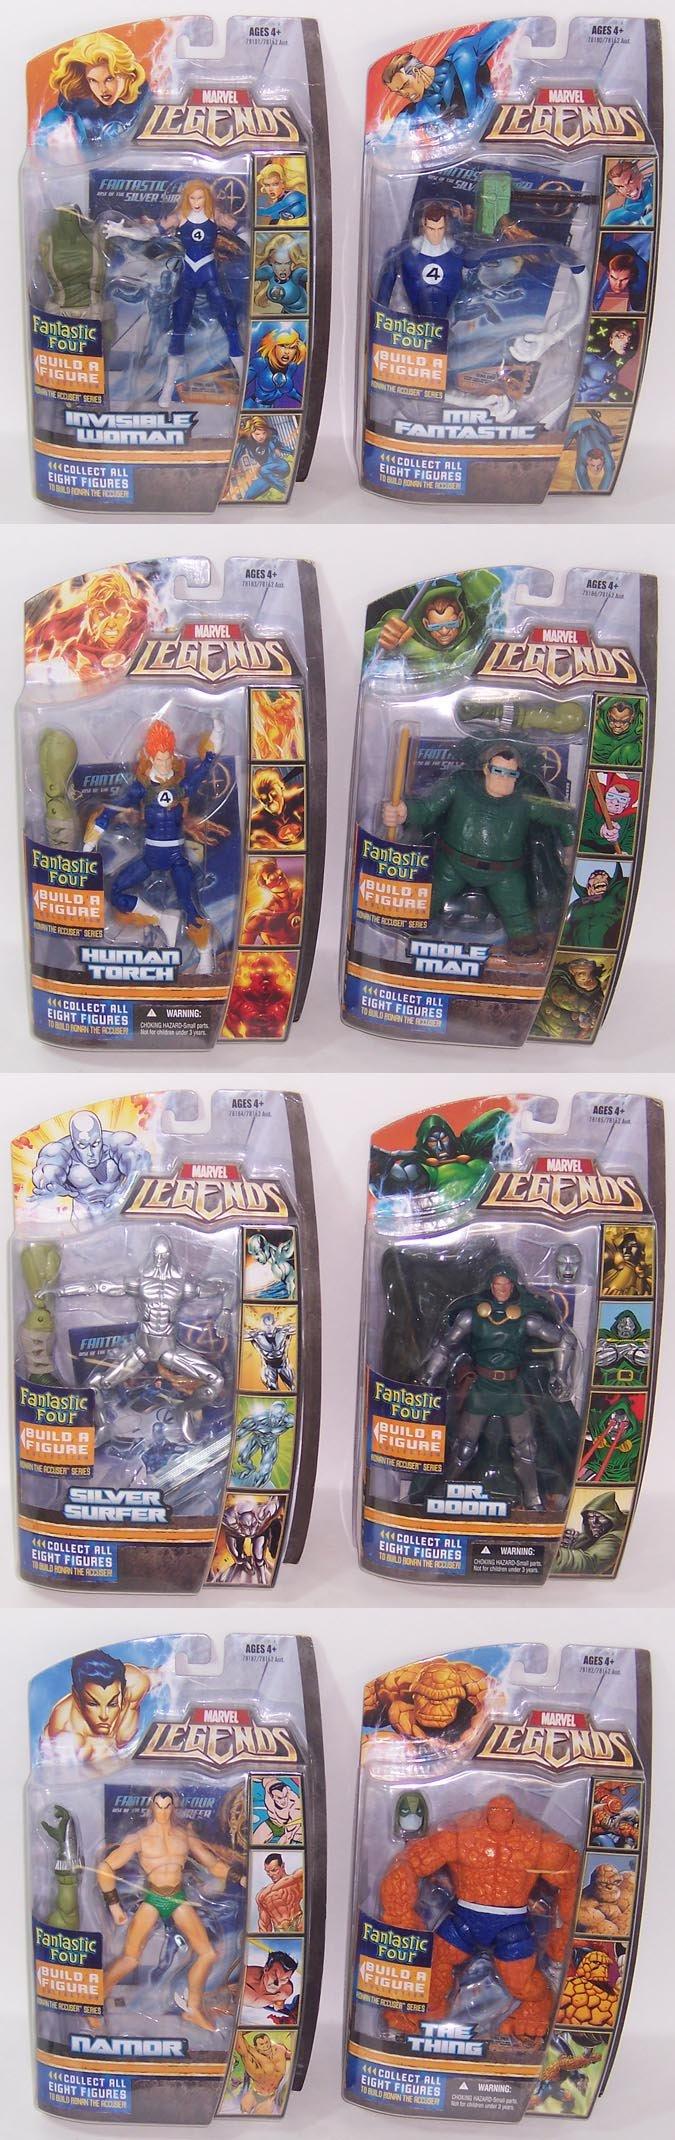 Marvel Legends Fantastic Four Build A Figure Invisible Woman Ronan The Accuser Series